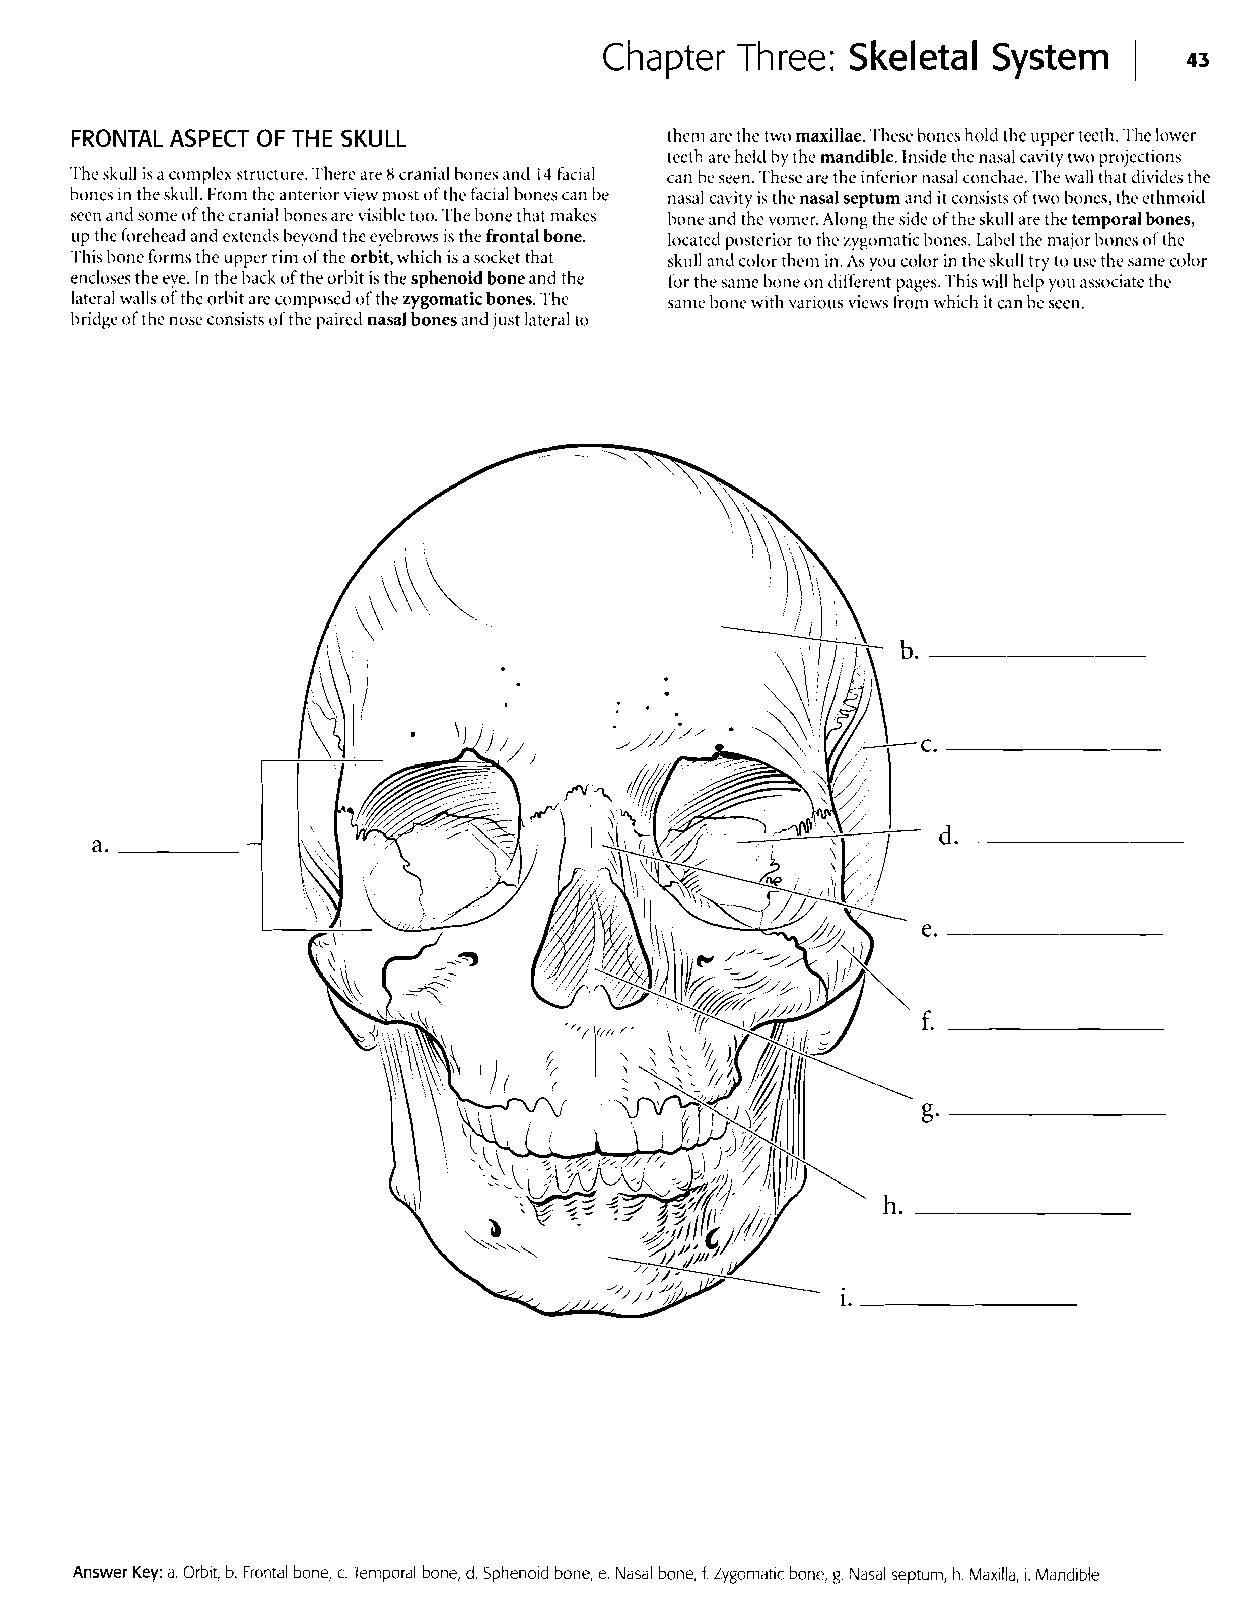 Kaplan Anatomy Coloring Book Pdf Anatomy Coloring Book Millie Marotta Coloring Book Coloring Books